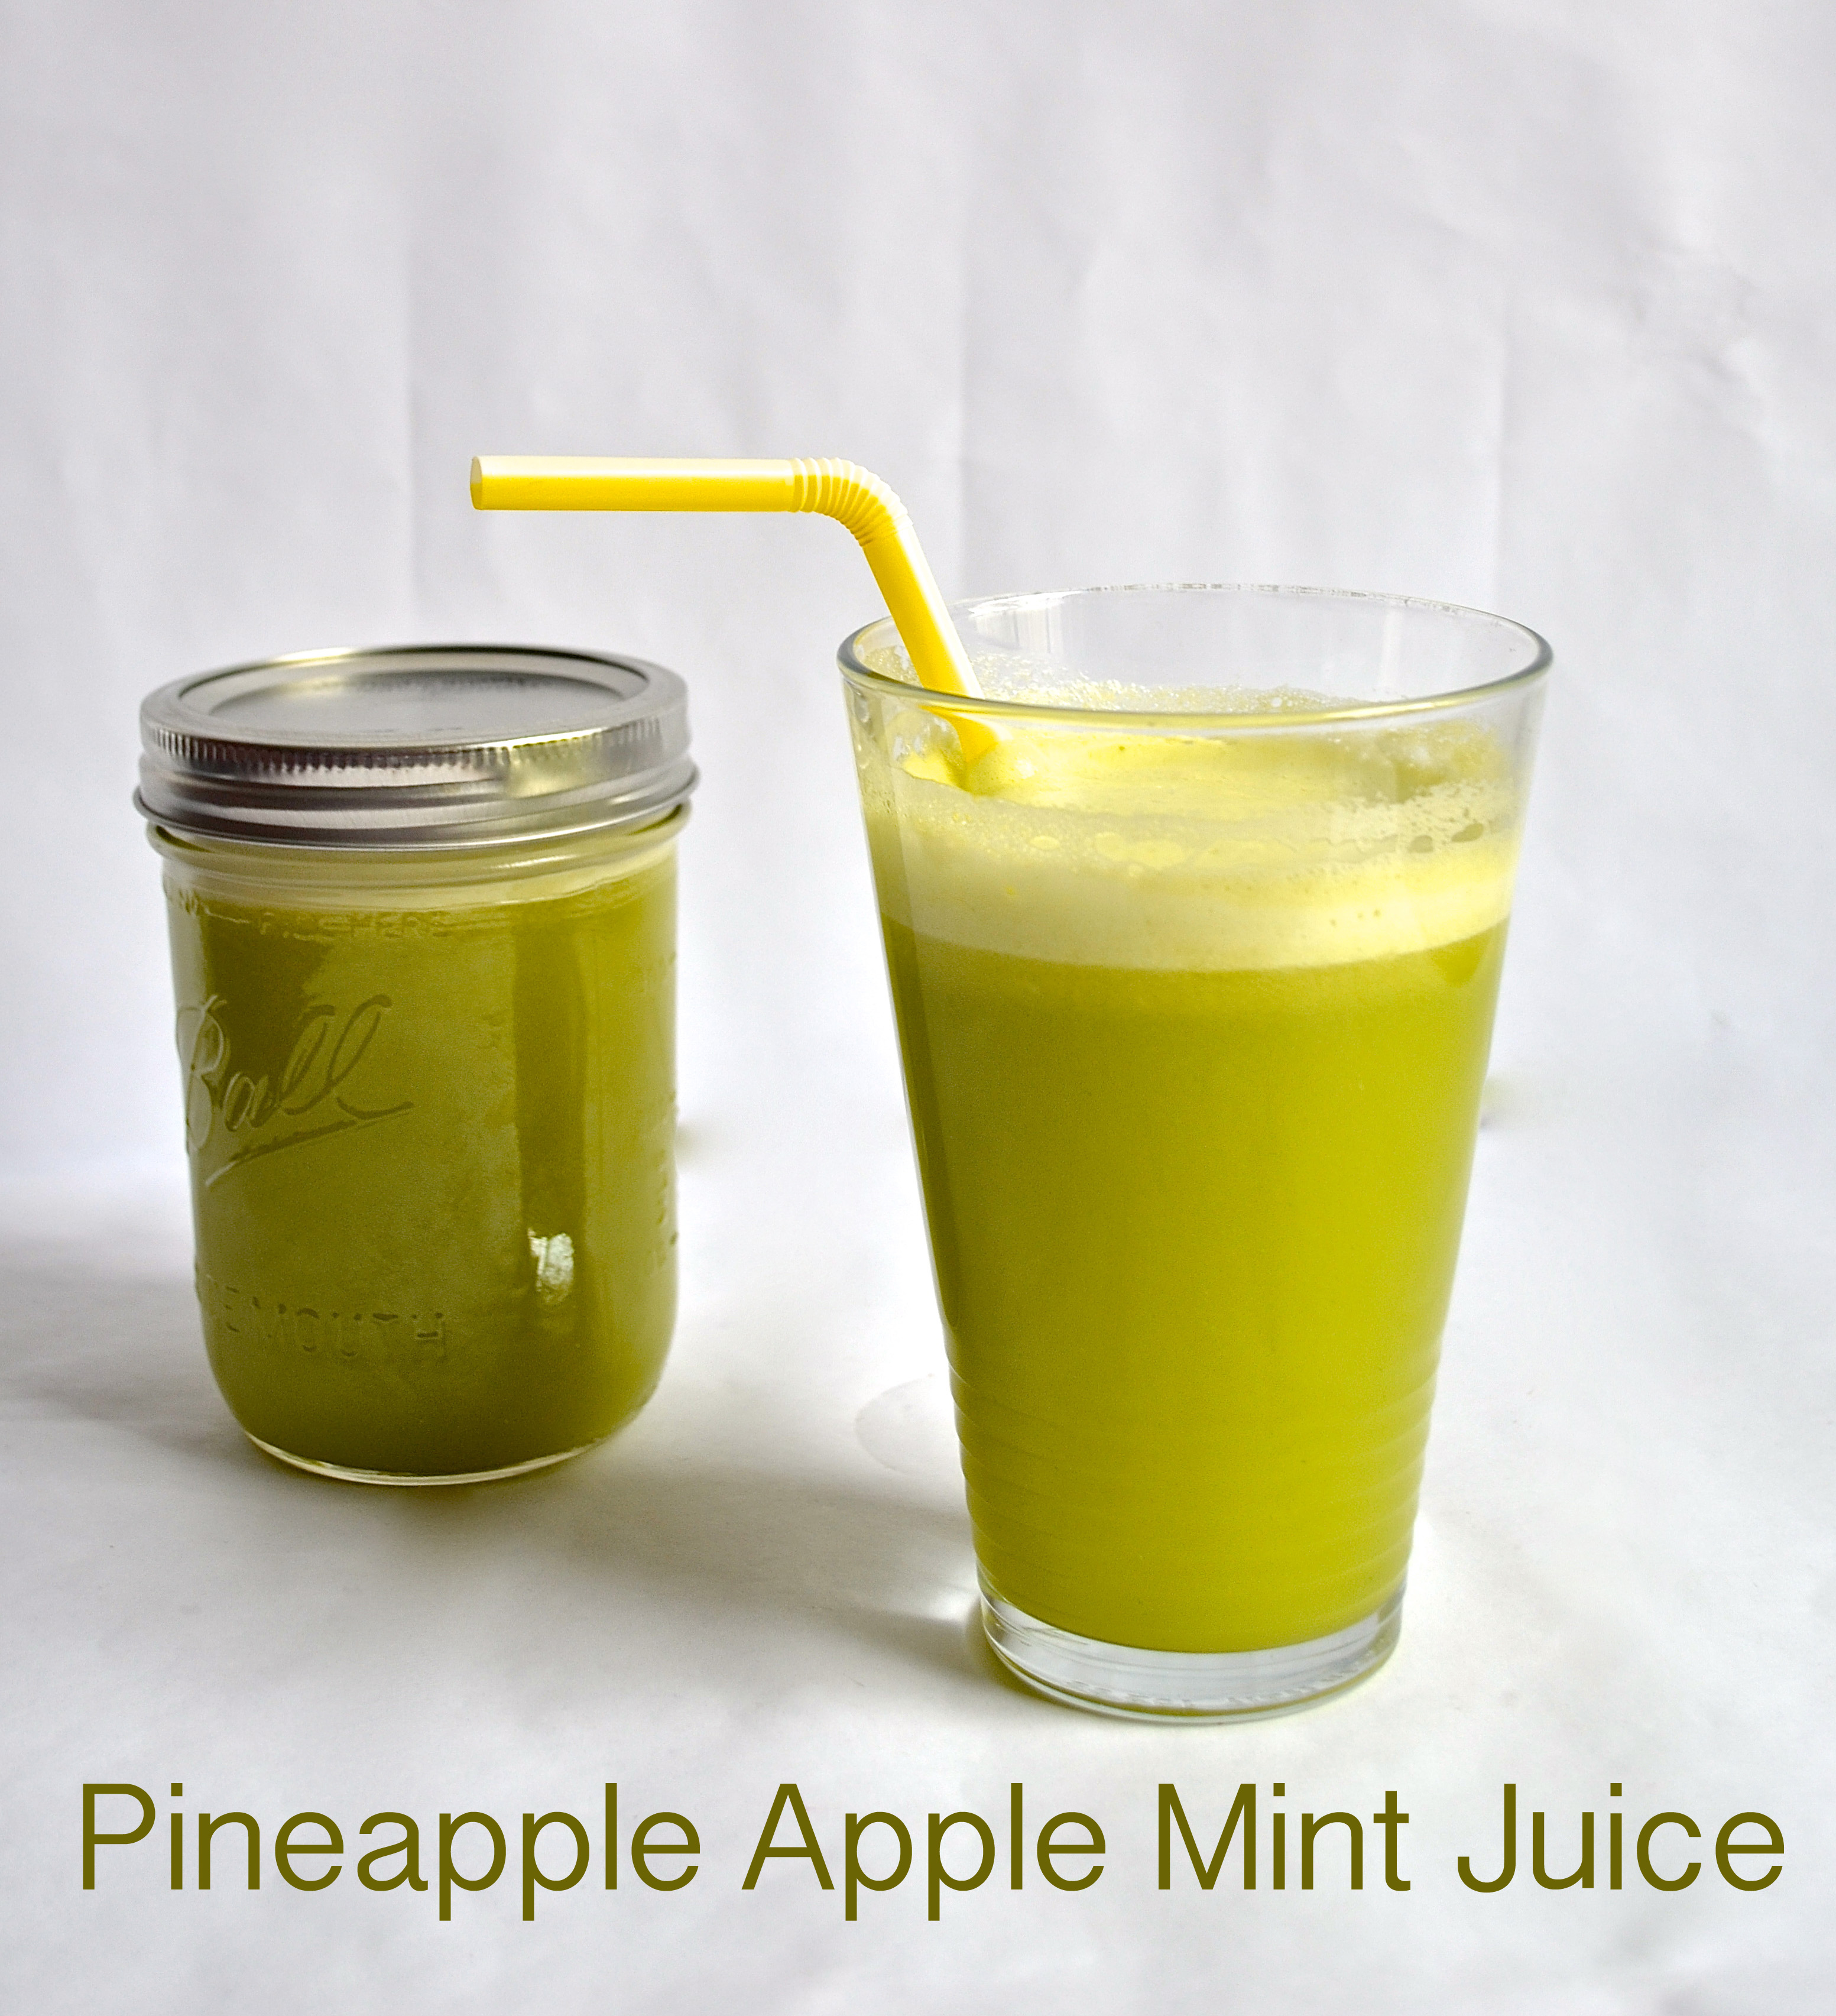 Apple Drink Juice Pineapple apple mint juice